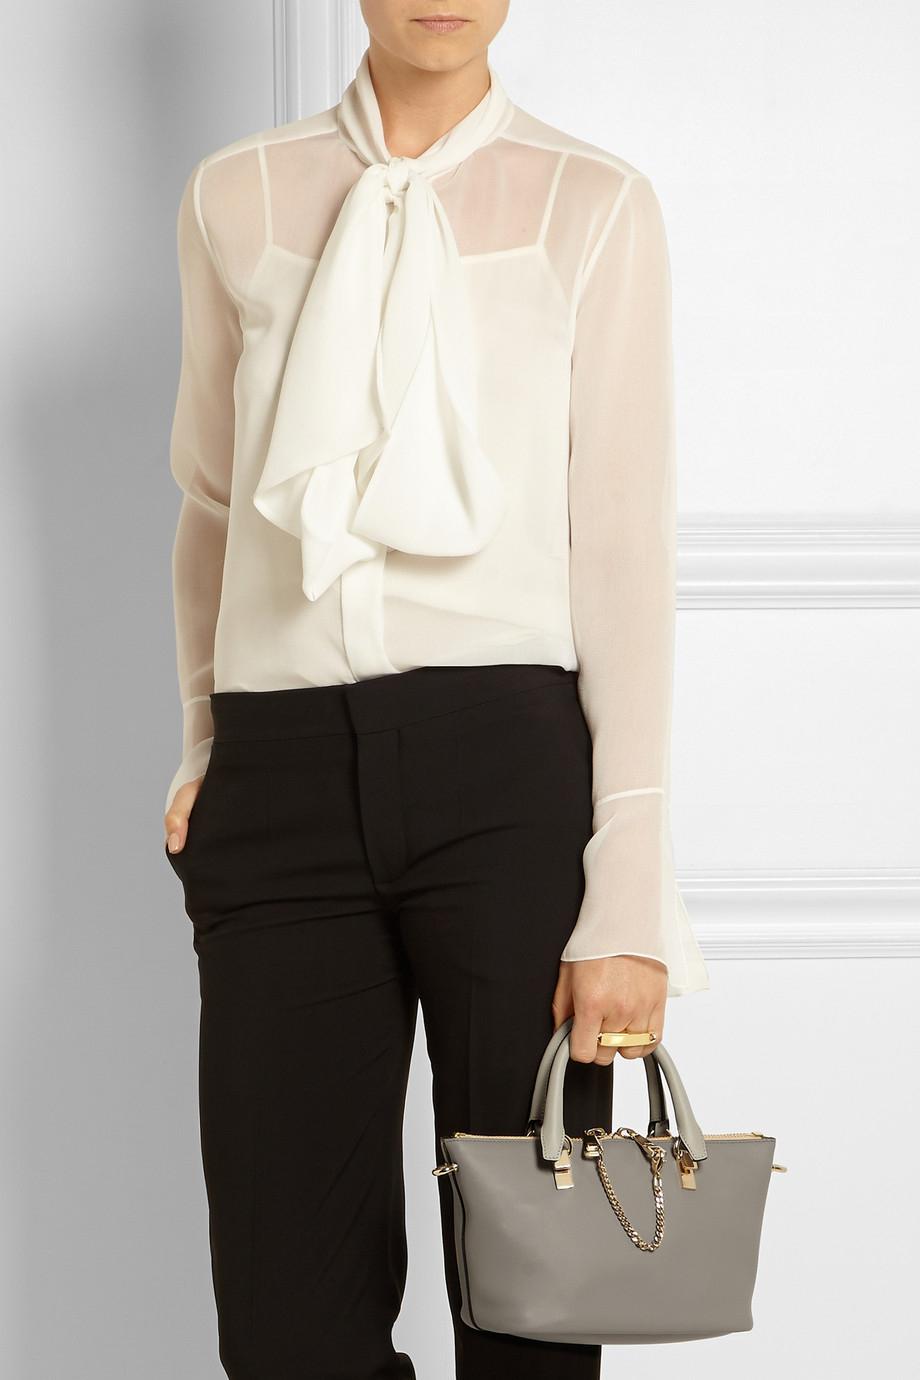 chloe baylee satchel leather mini